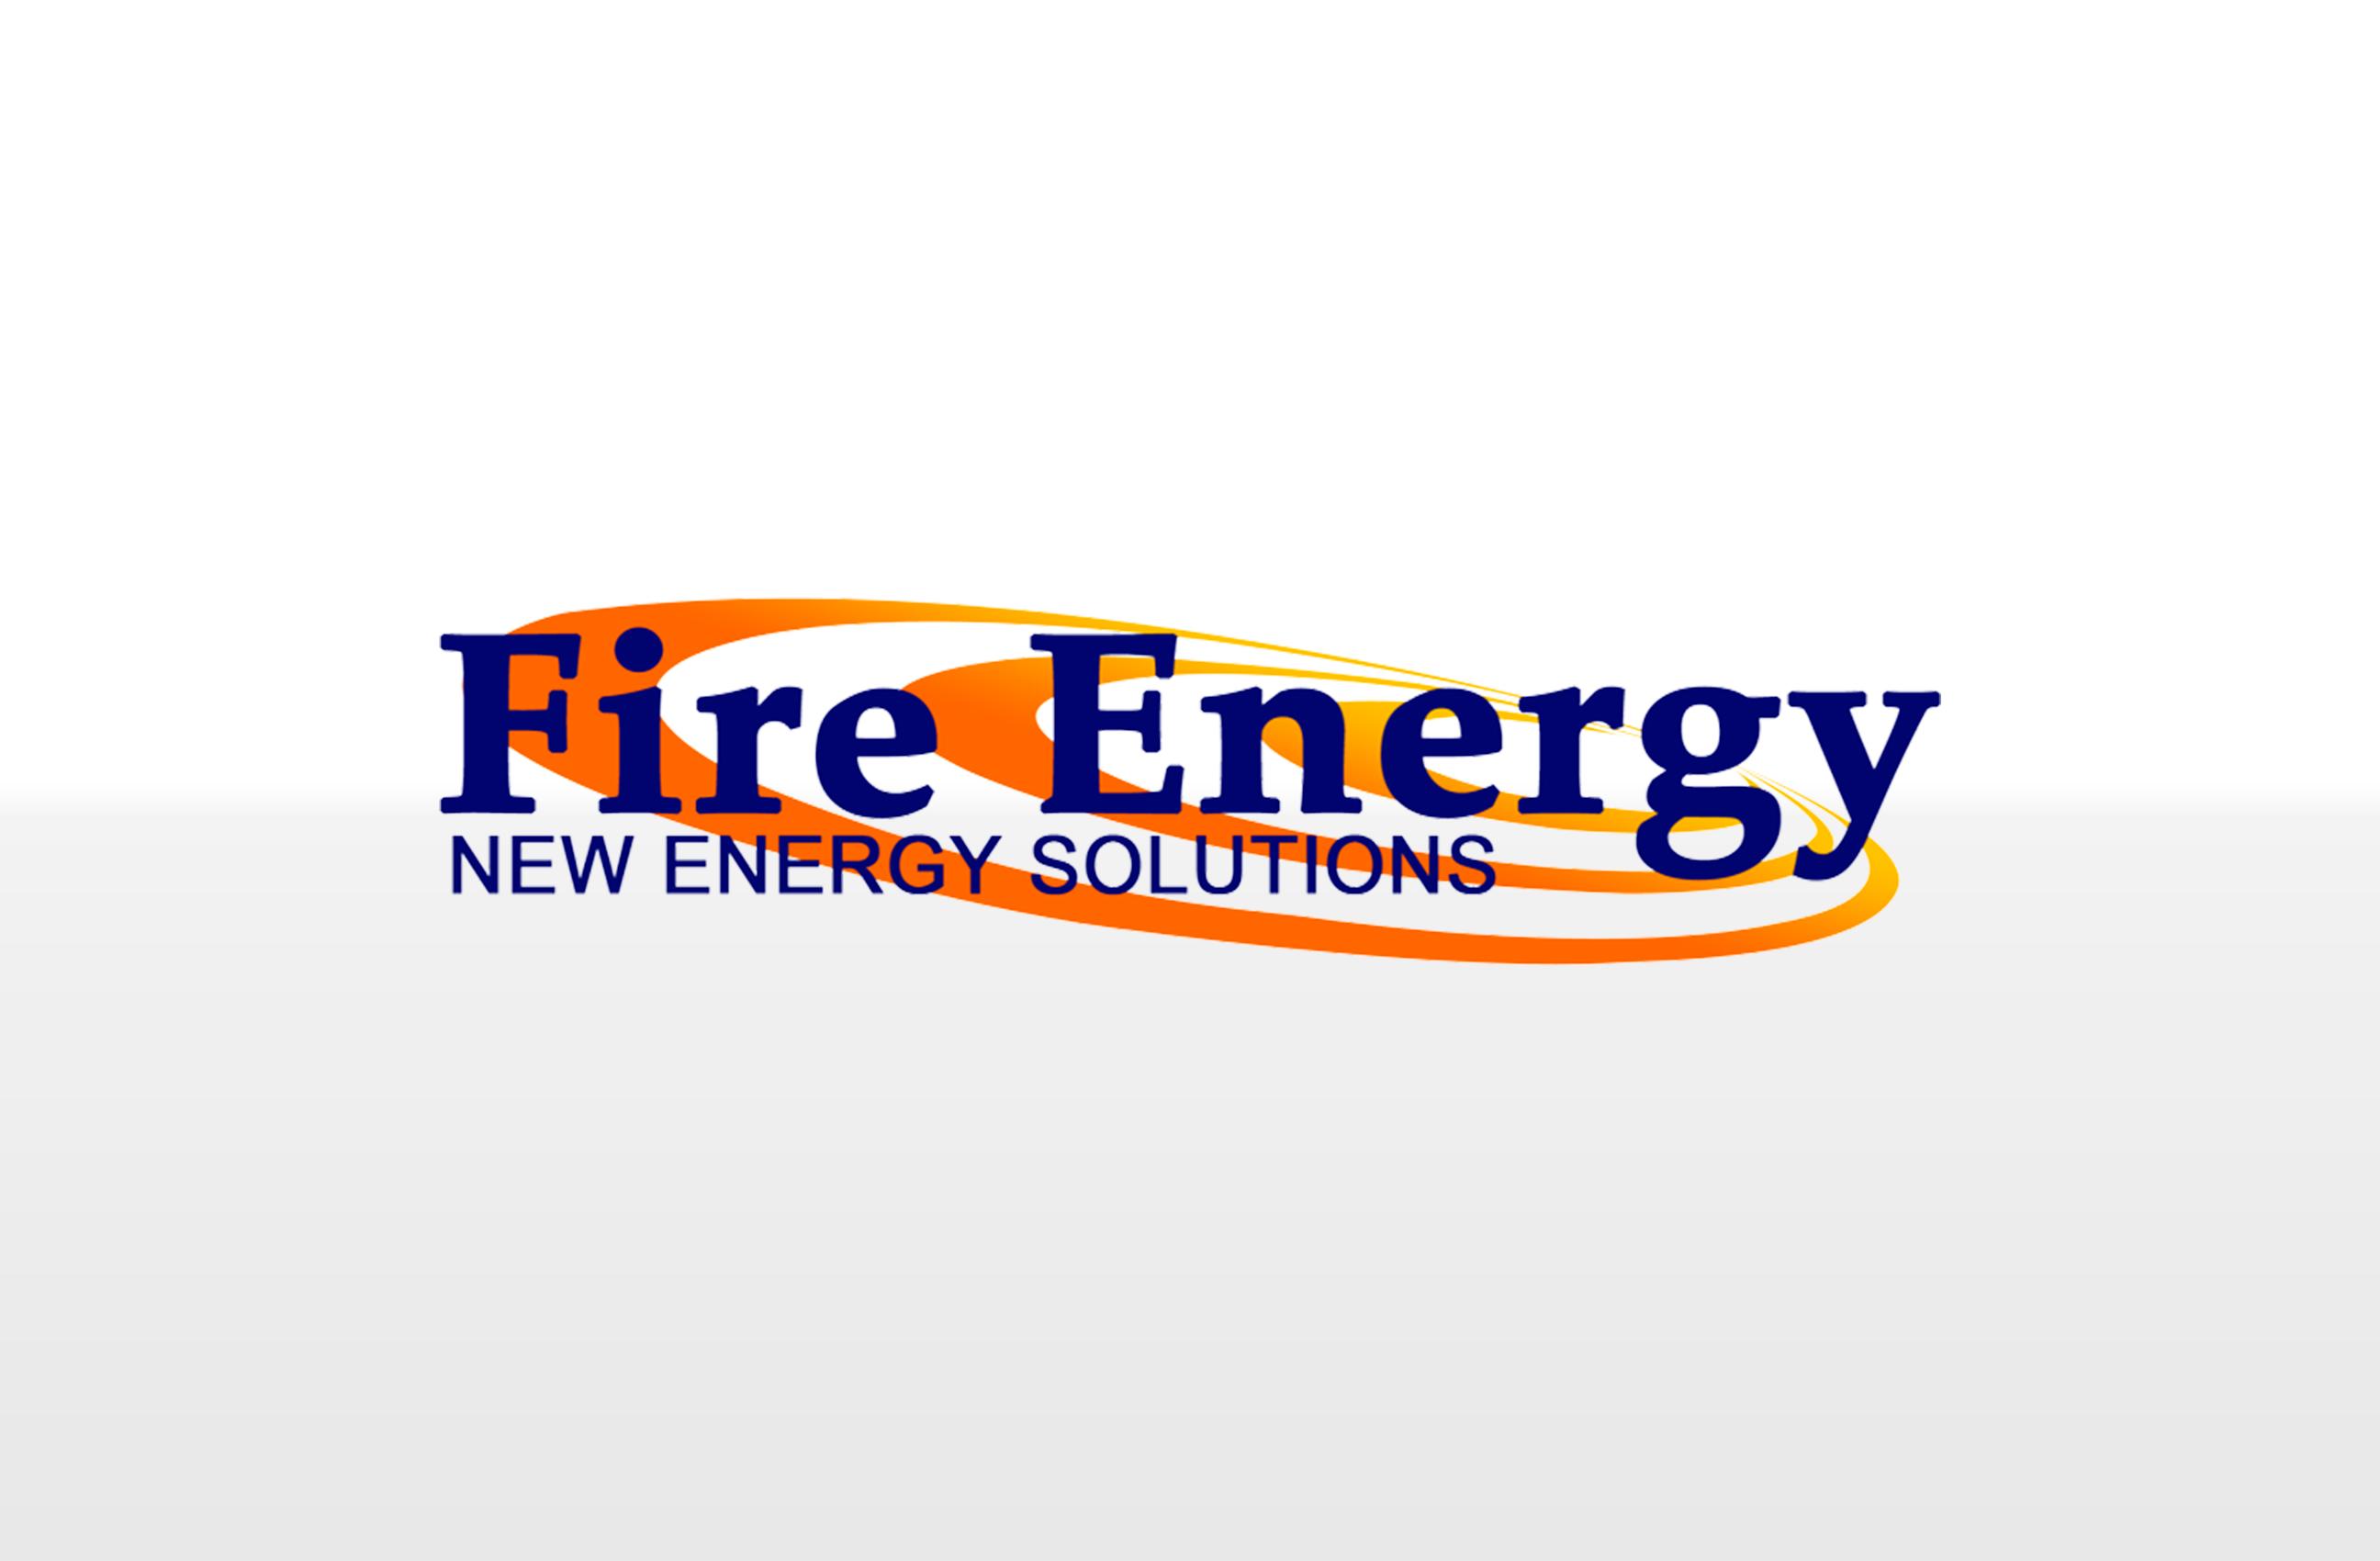 Fire Energy Group